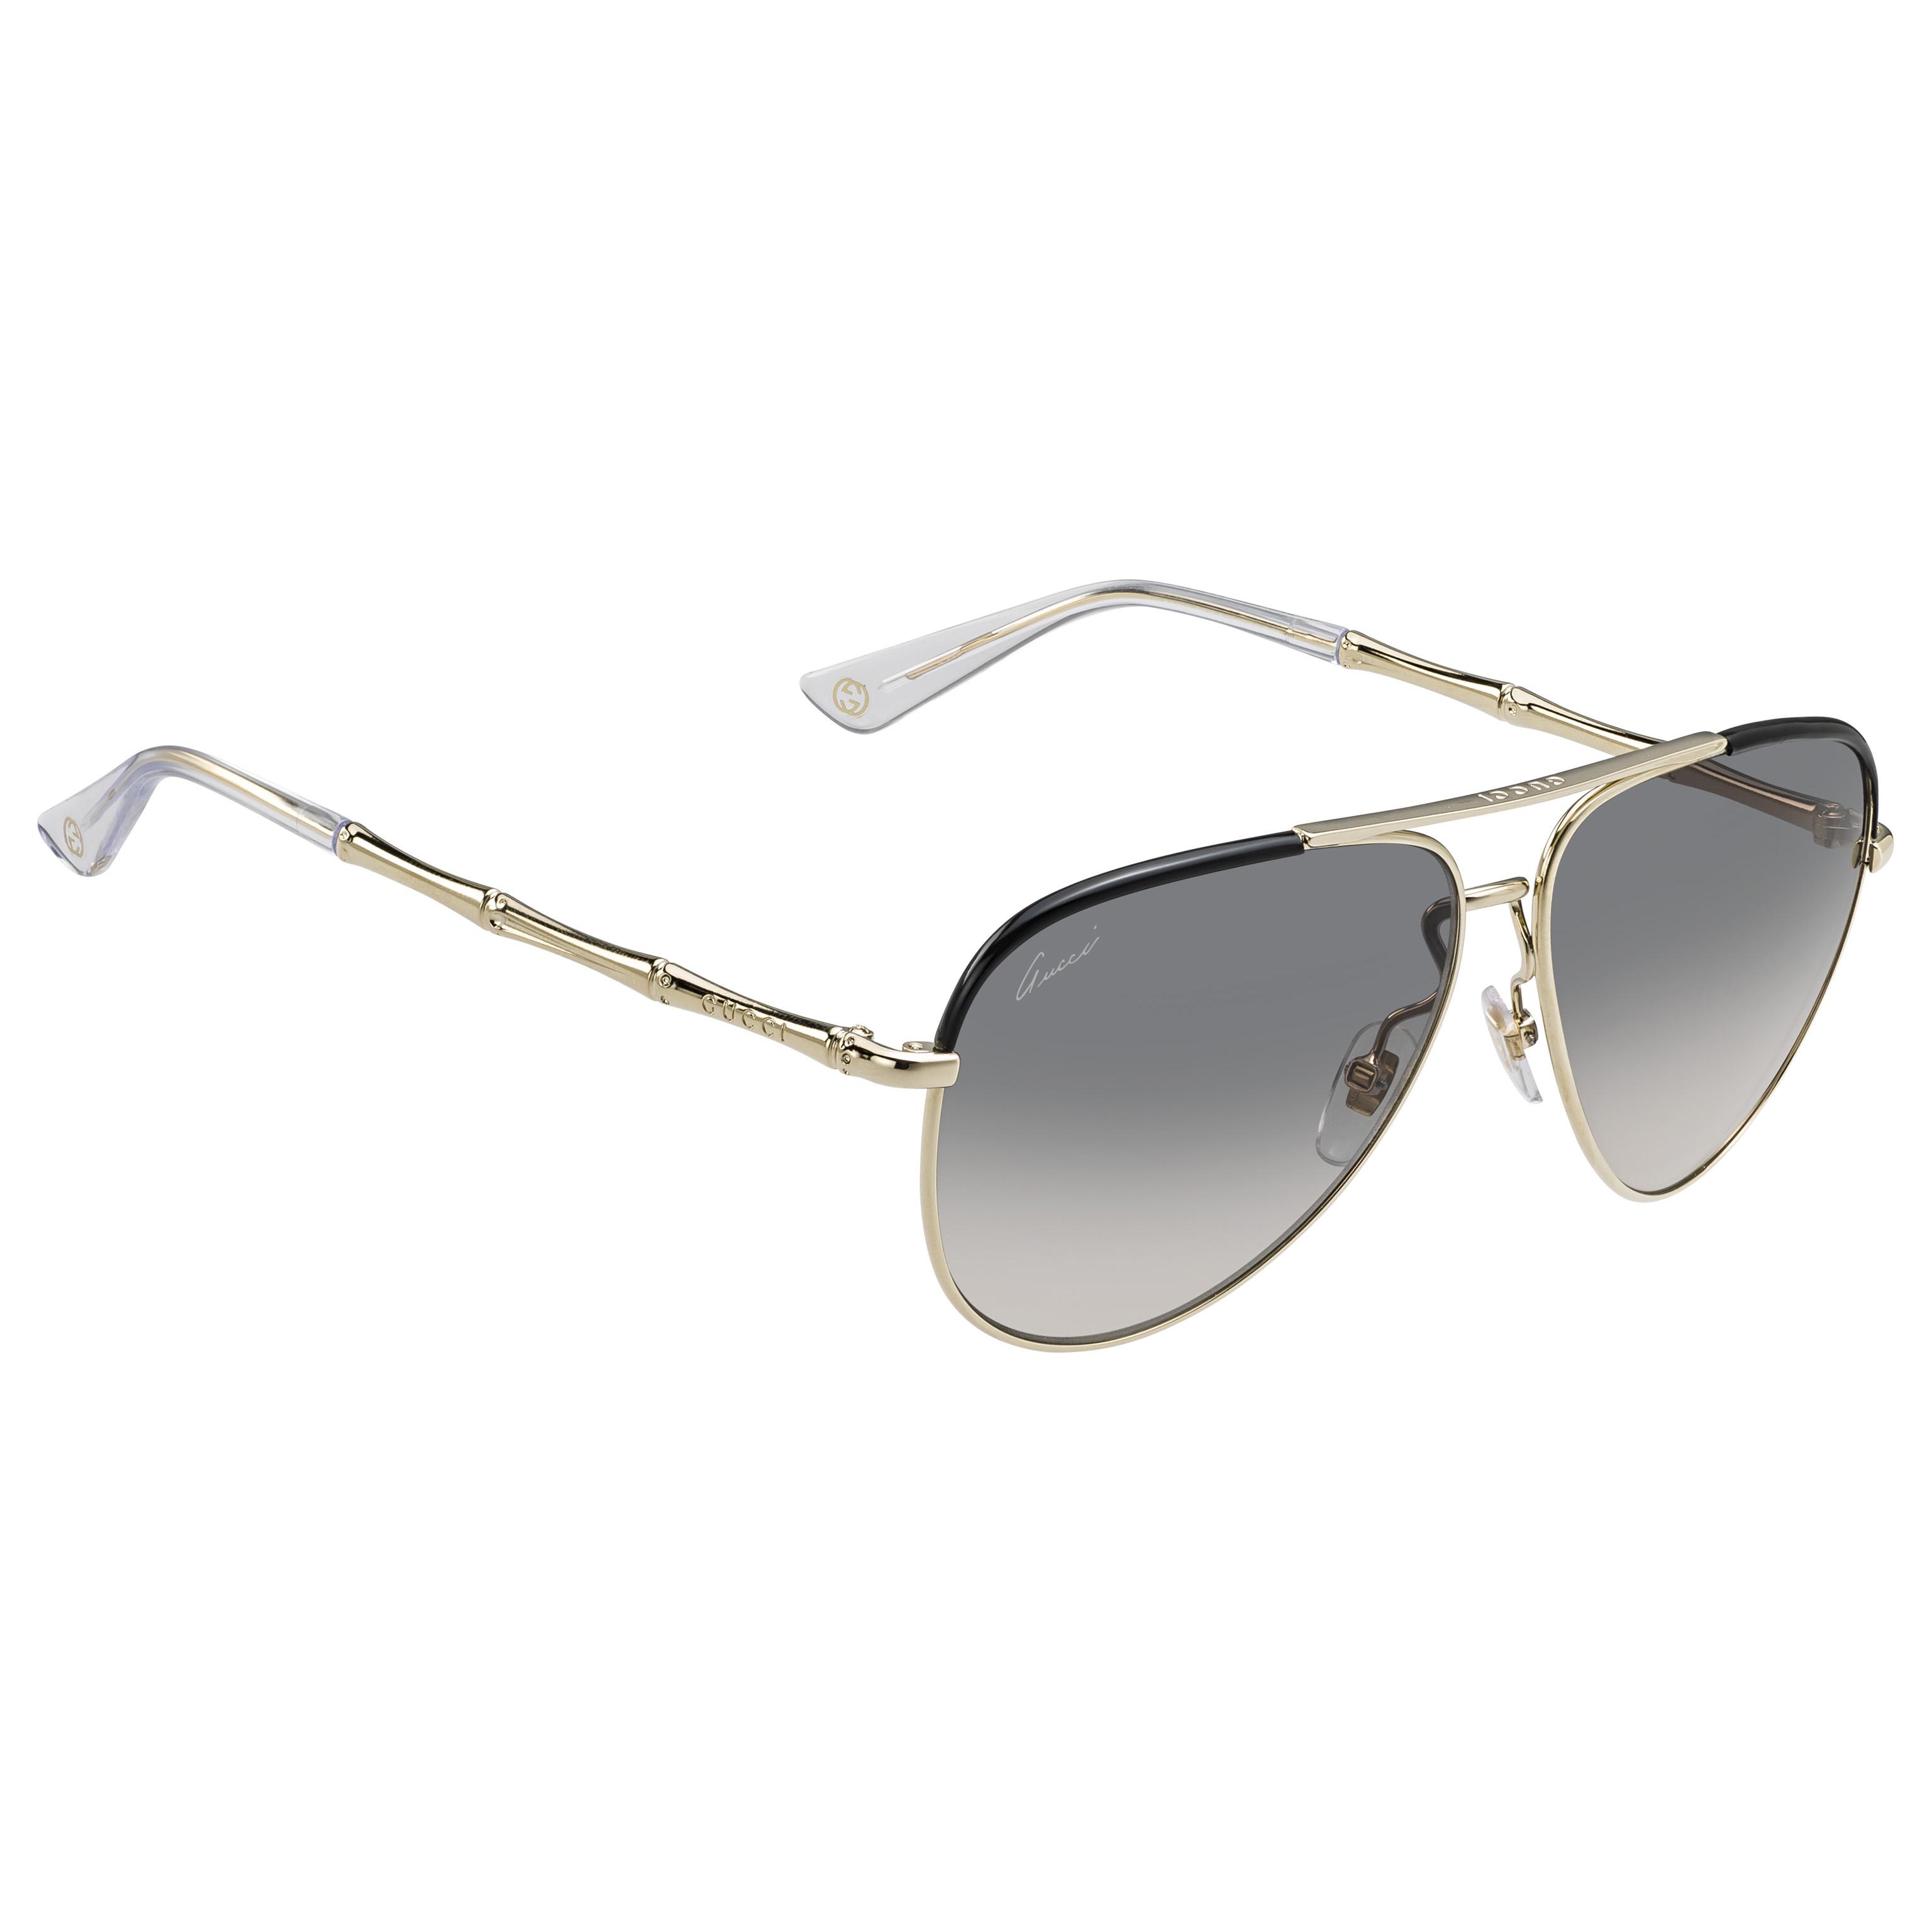 8efa37b78cc Gucci zonnebrillenOptiek Lammerant